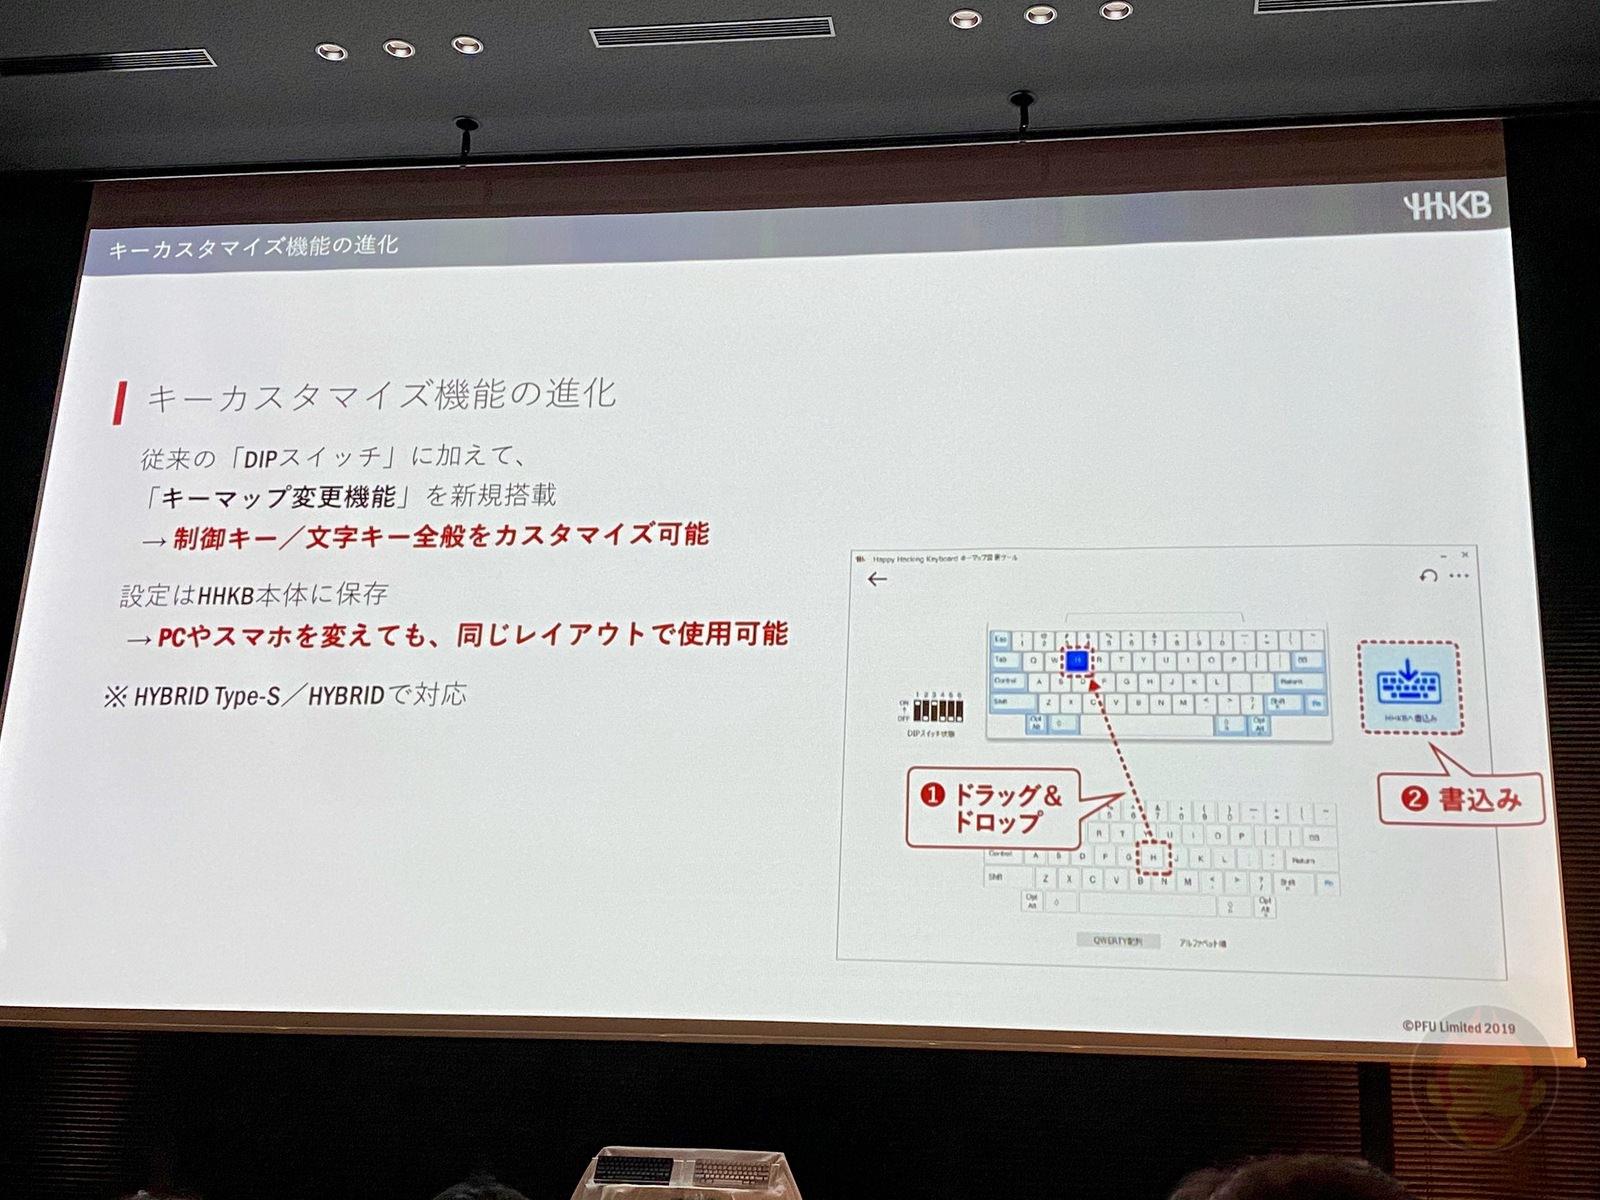 Happy-Hacking-Keyboard-New-Model-Presentation-06.jpeg